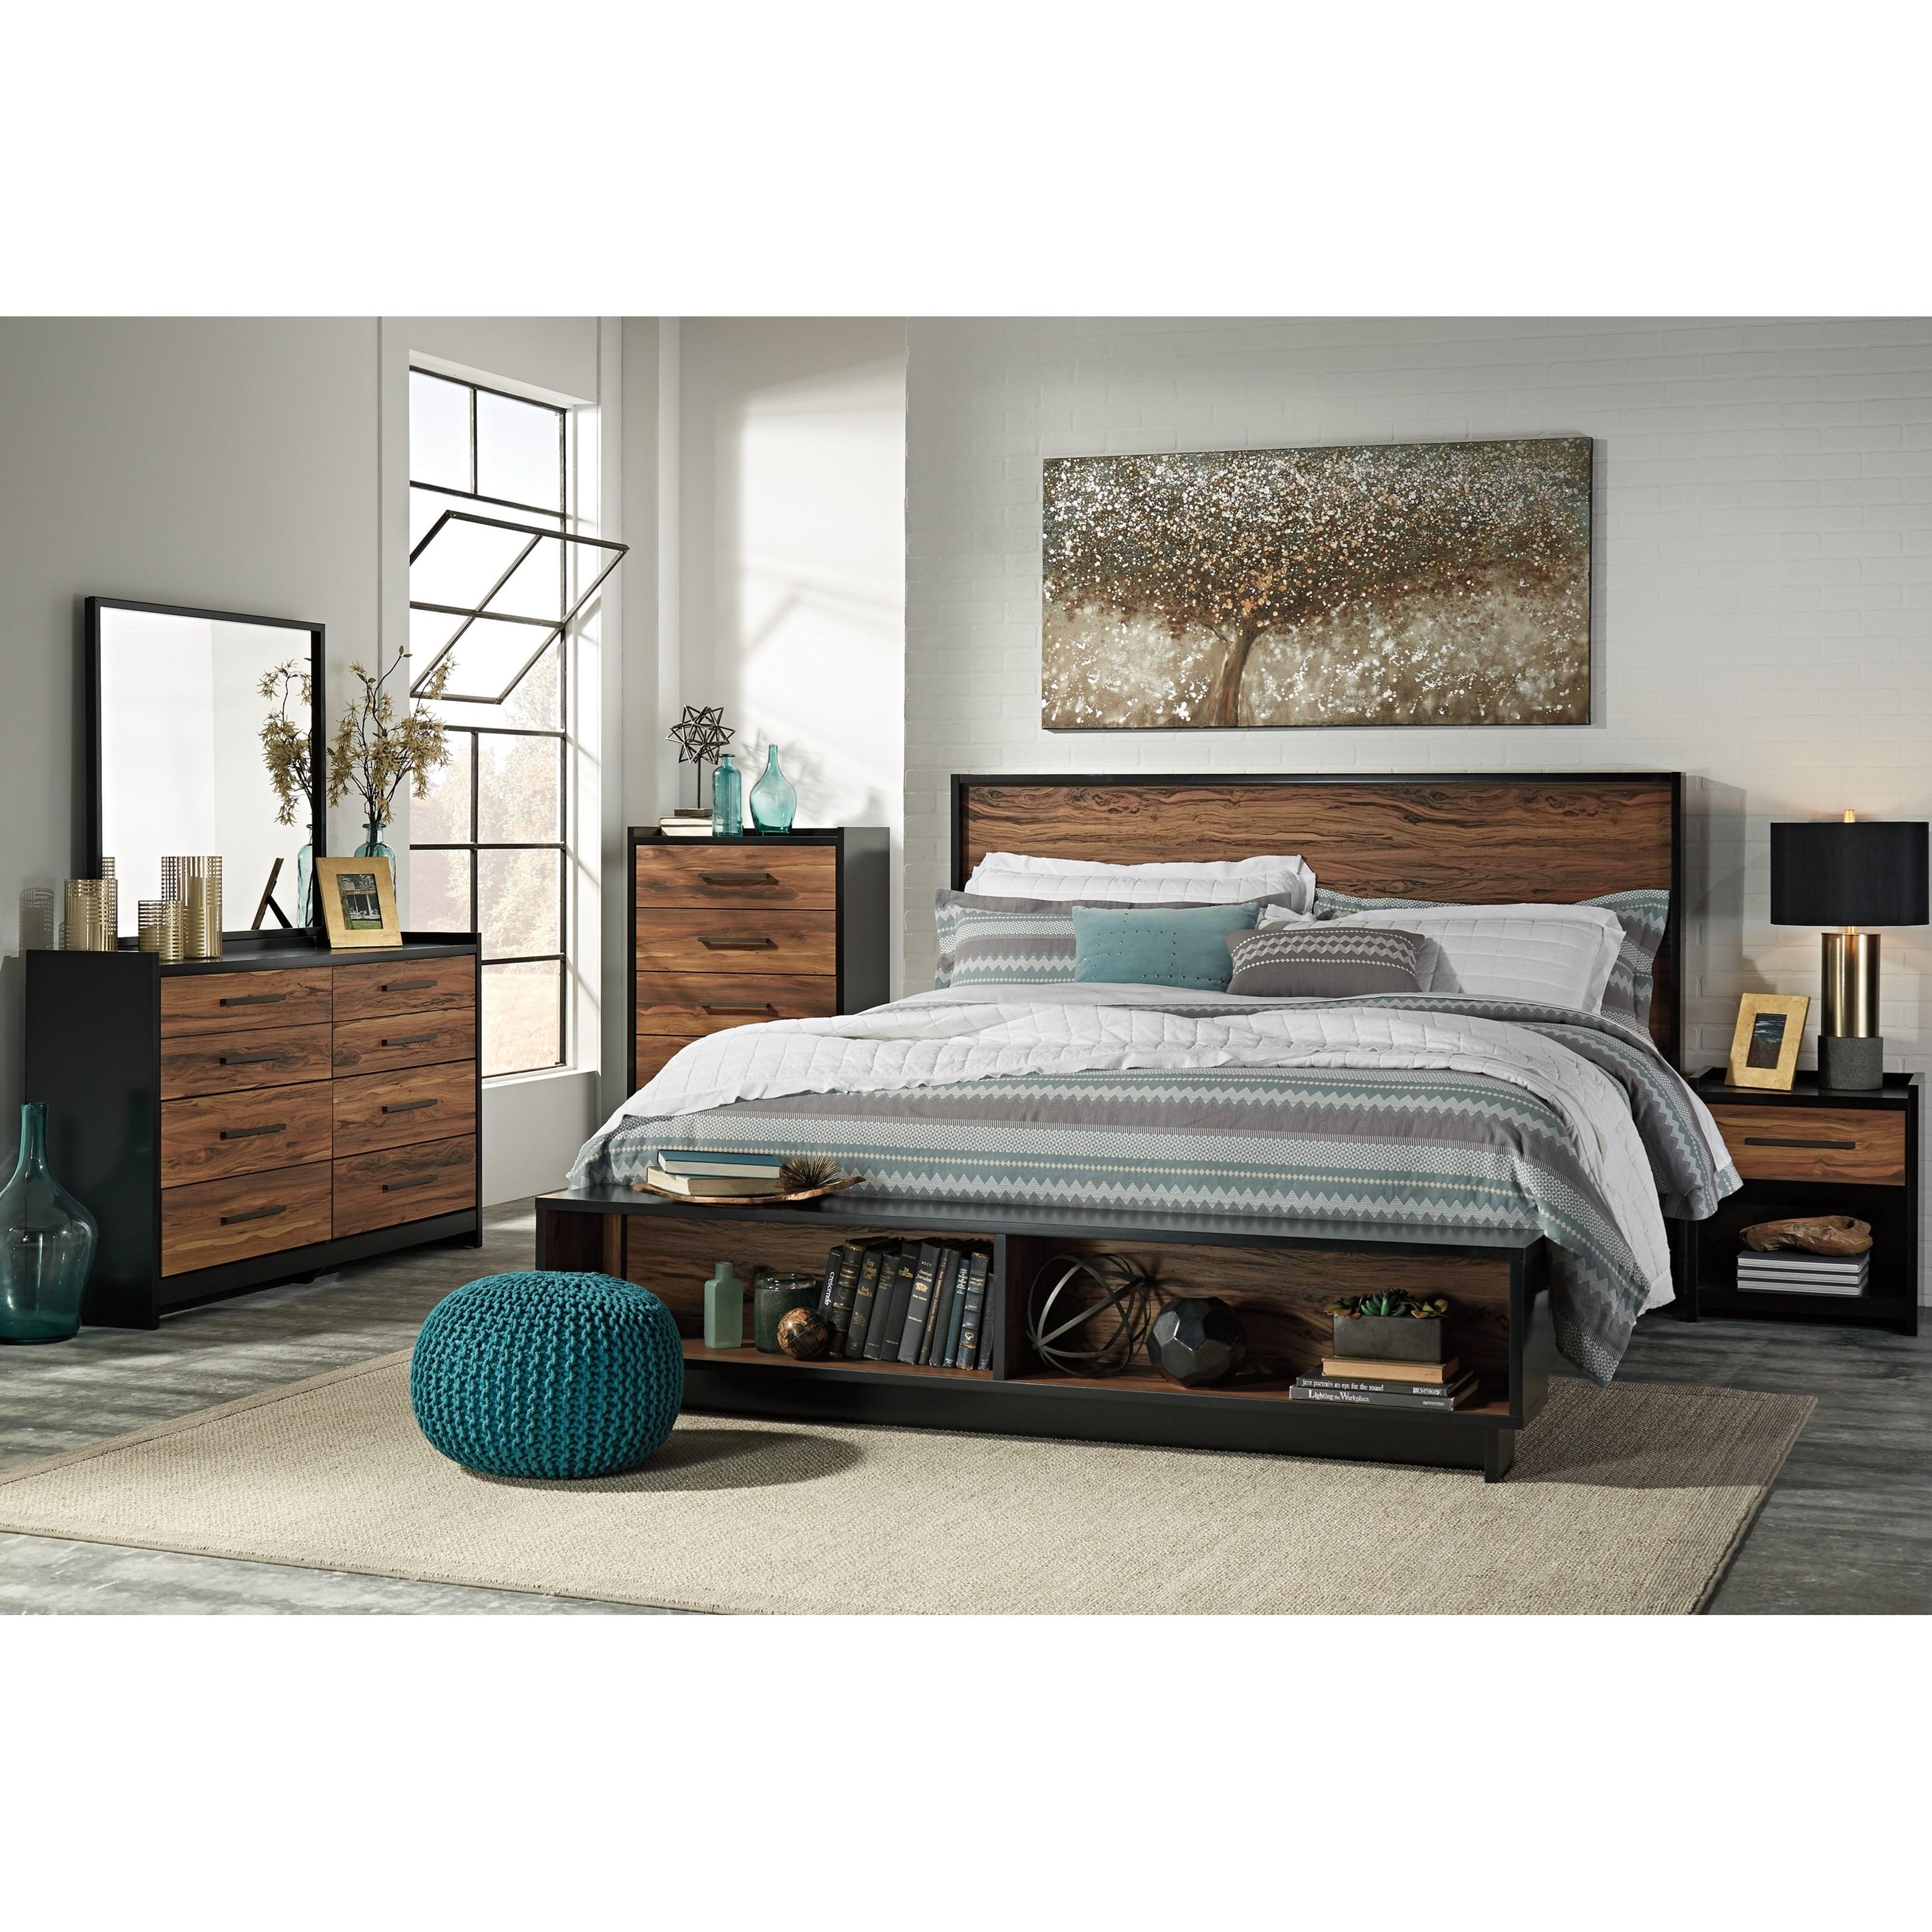 Signature Design by Ashley Stavani King Bedroom Group Del Sol Furniture B